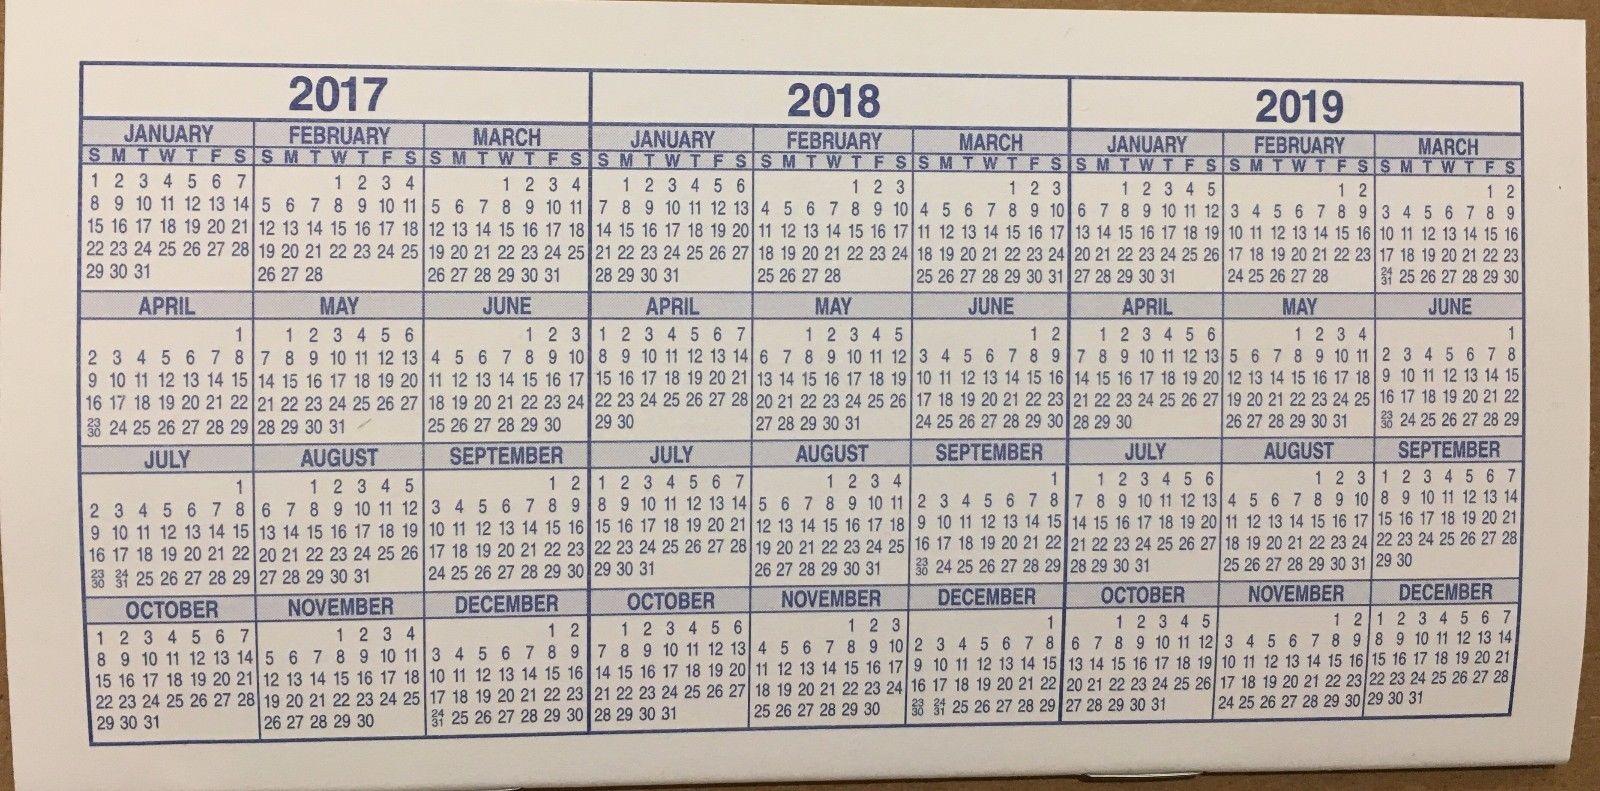 20 Checkbook Transaction Register Calendar 2018 2019 2020 Check